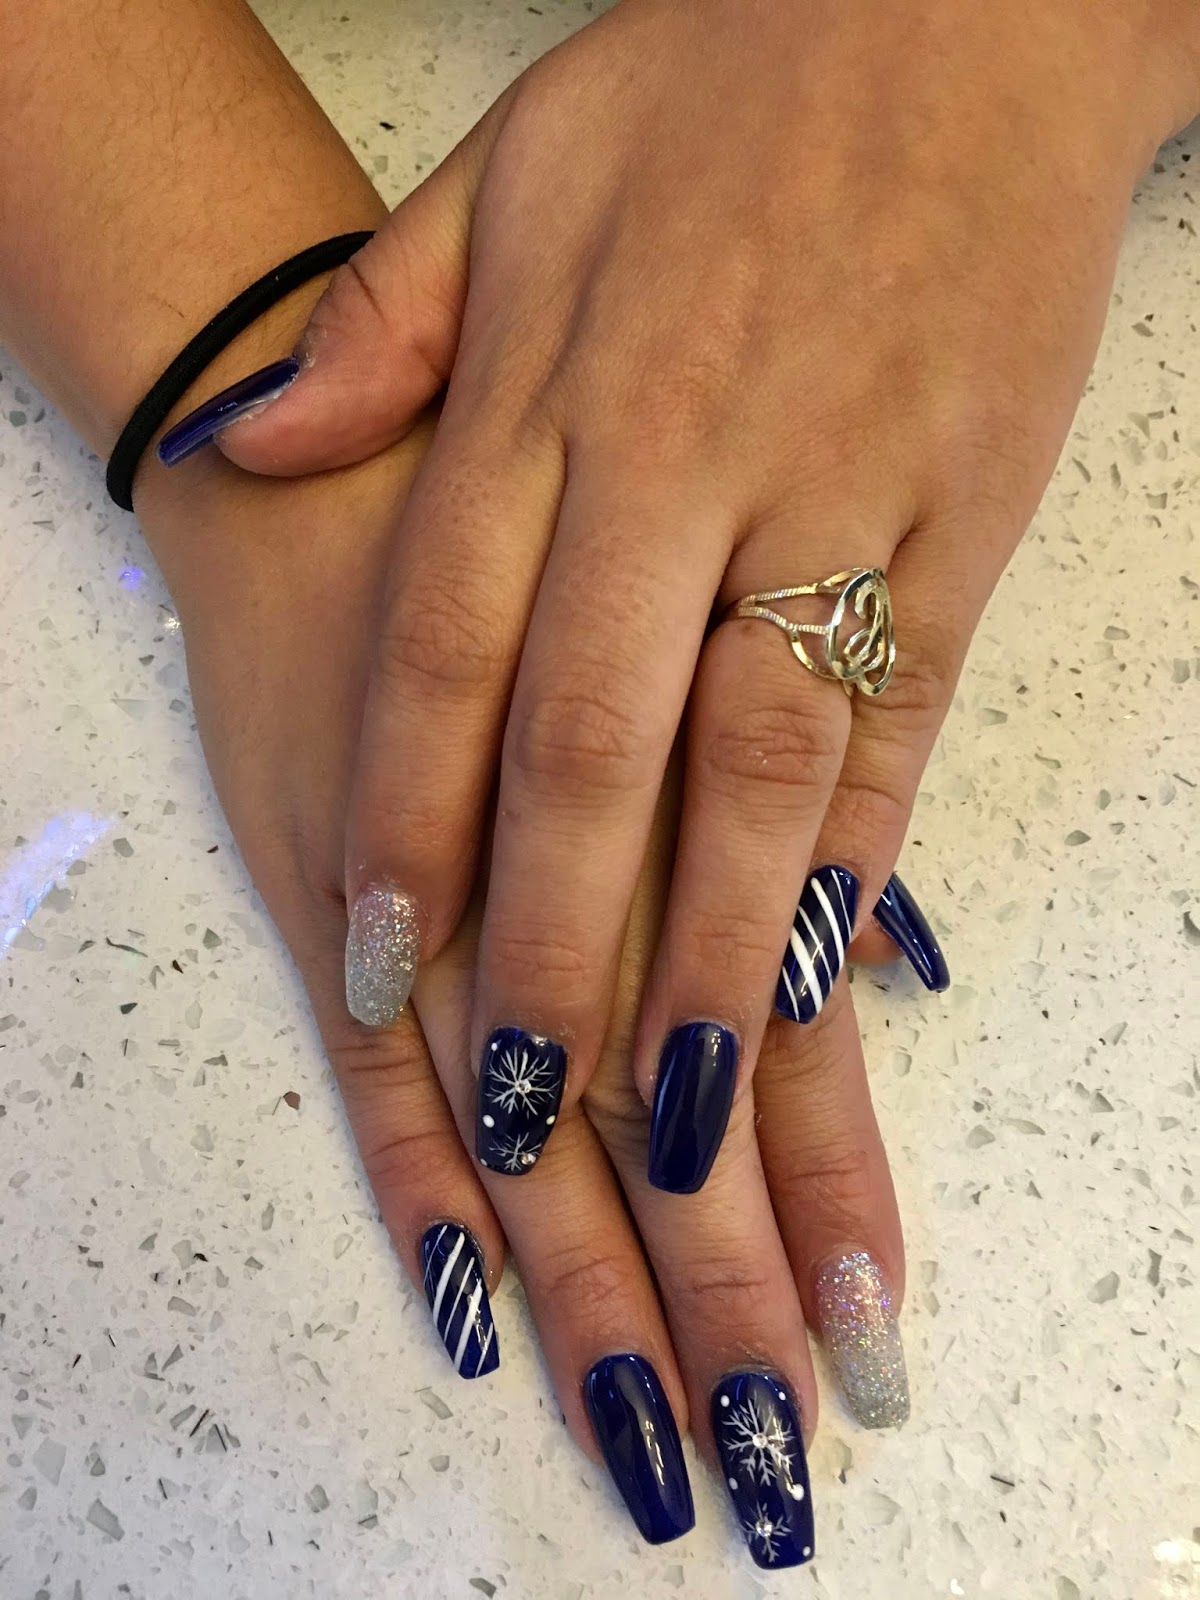 Nail Salon By Kohls : salon, kohls, Offers, Standout, Customer, Service,, Amenities, Menifee